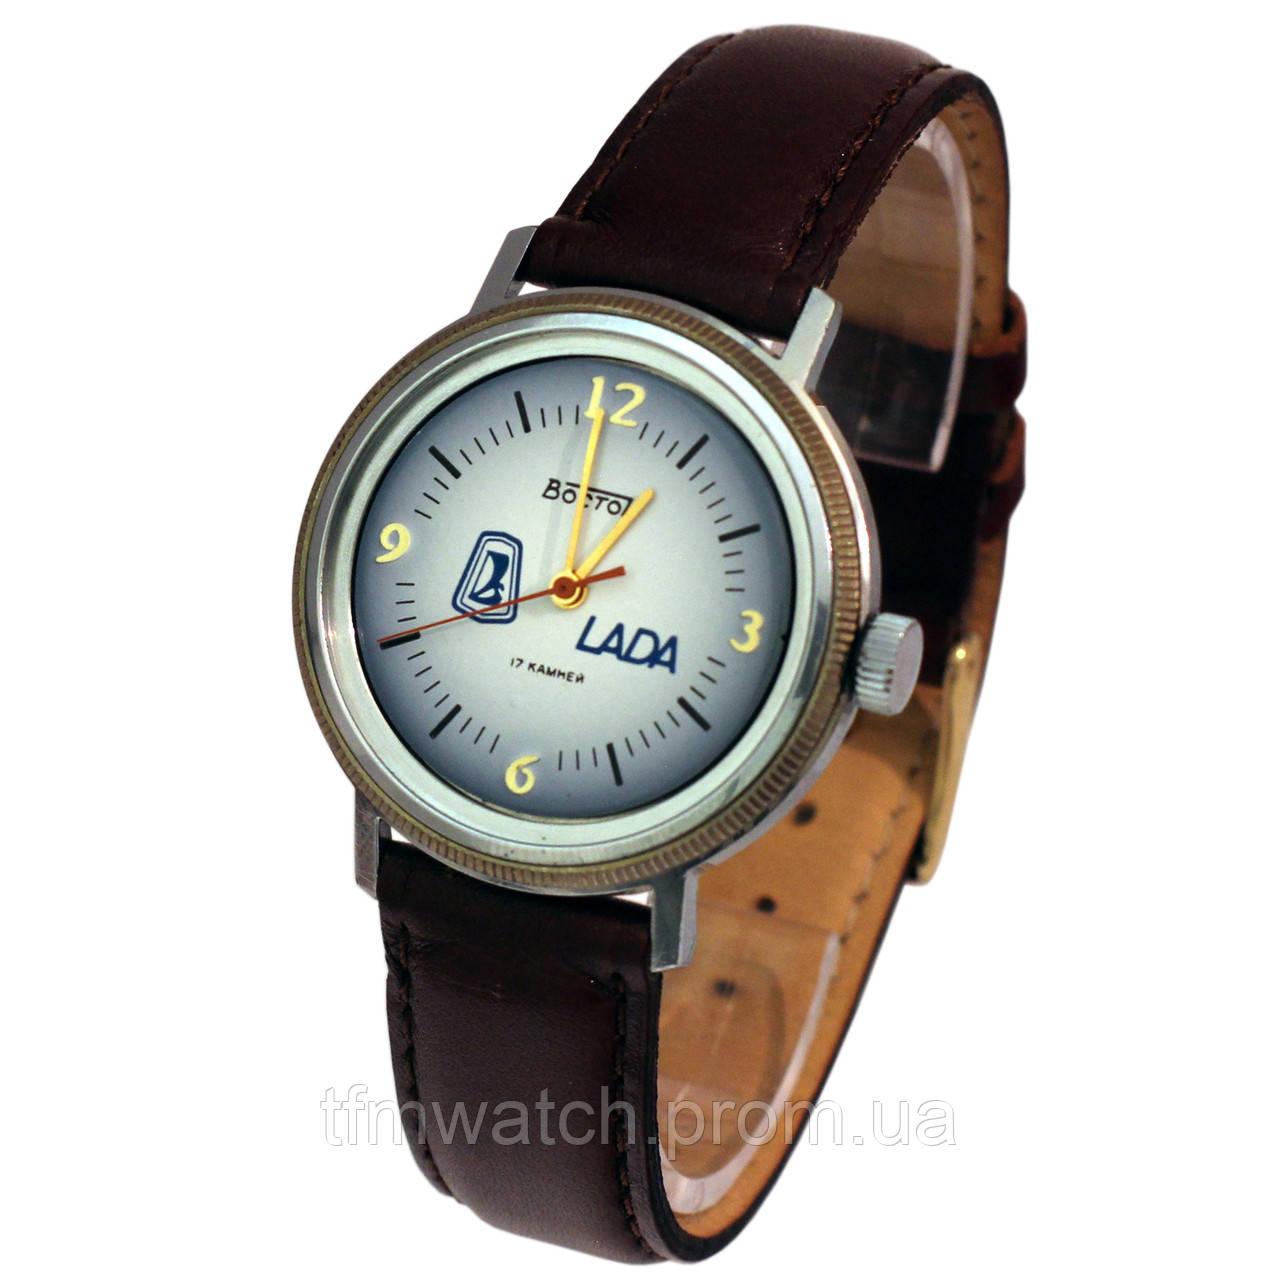 Часы наручные lada часы модные женские наручные 2017 эпл